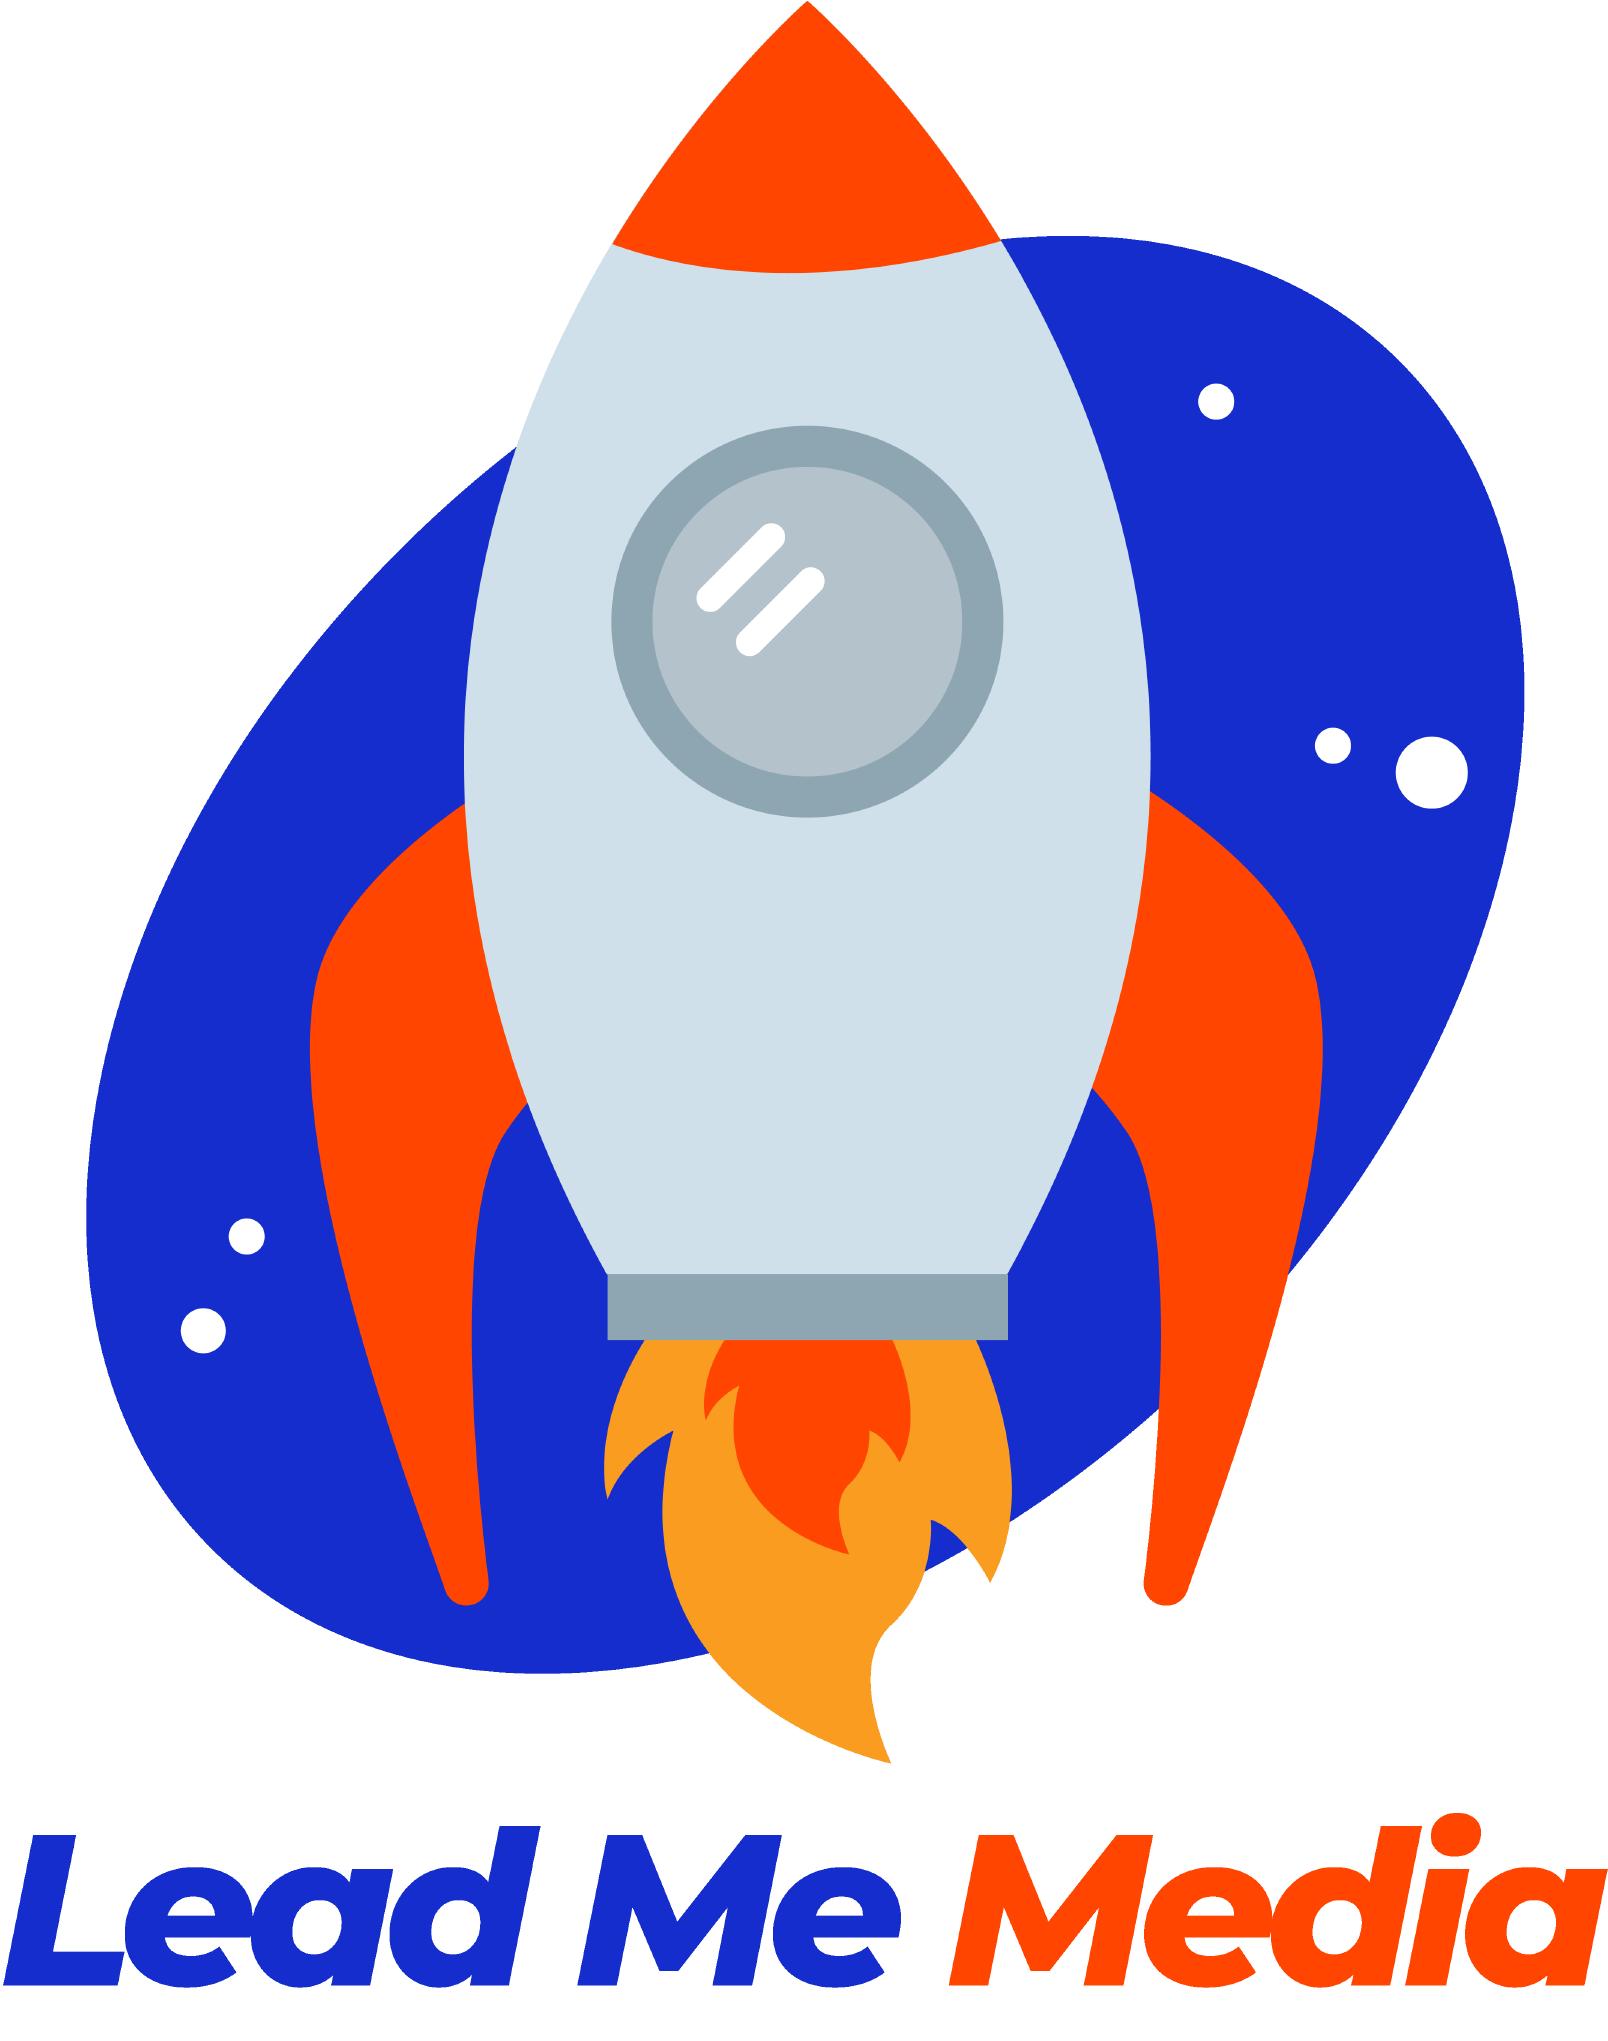 lead me media color logo